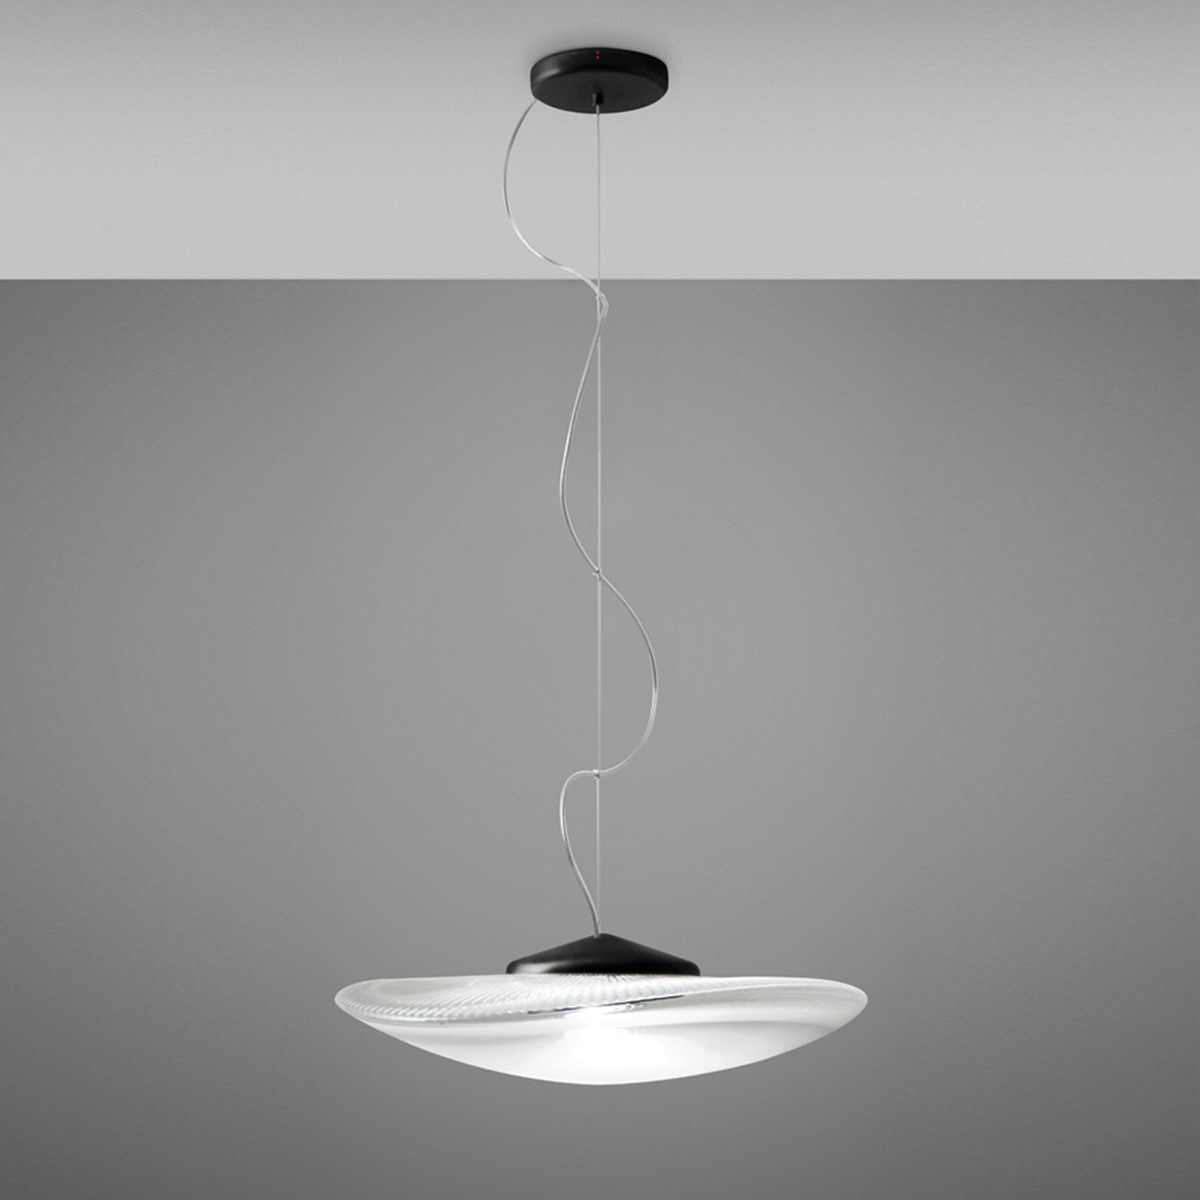 Fabbian Loop Pendelleuchte, schwarz - transparent